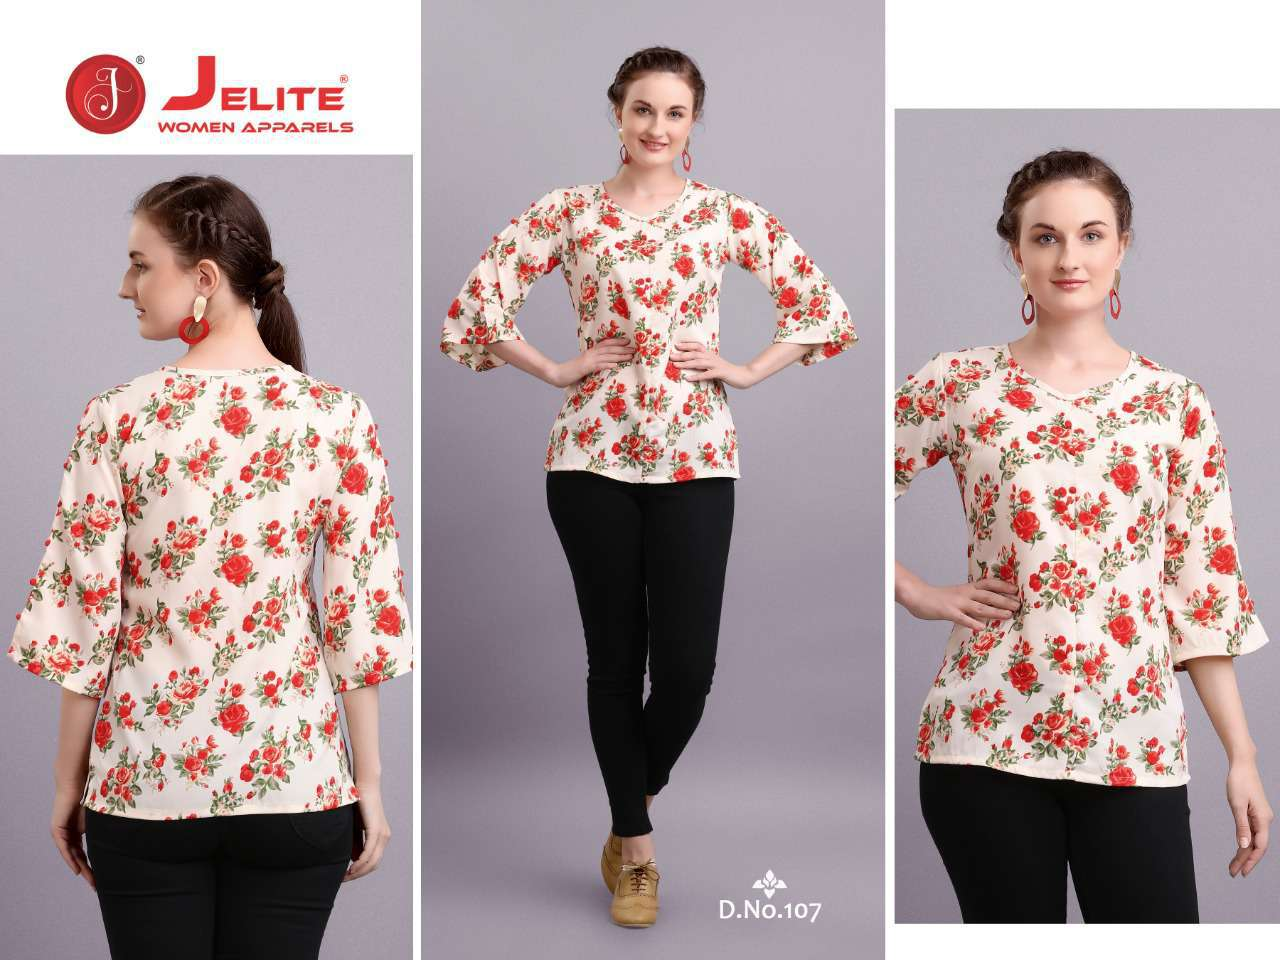 Jelite Tulip Tops Wholesale Catalog 8 Pcs 6 - Jelite Tulip Tops Wholesale Catalog 8 Pcs